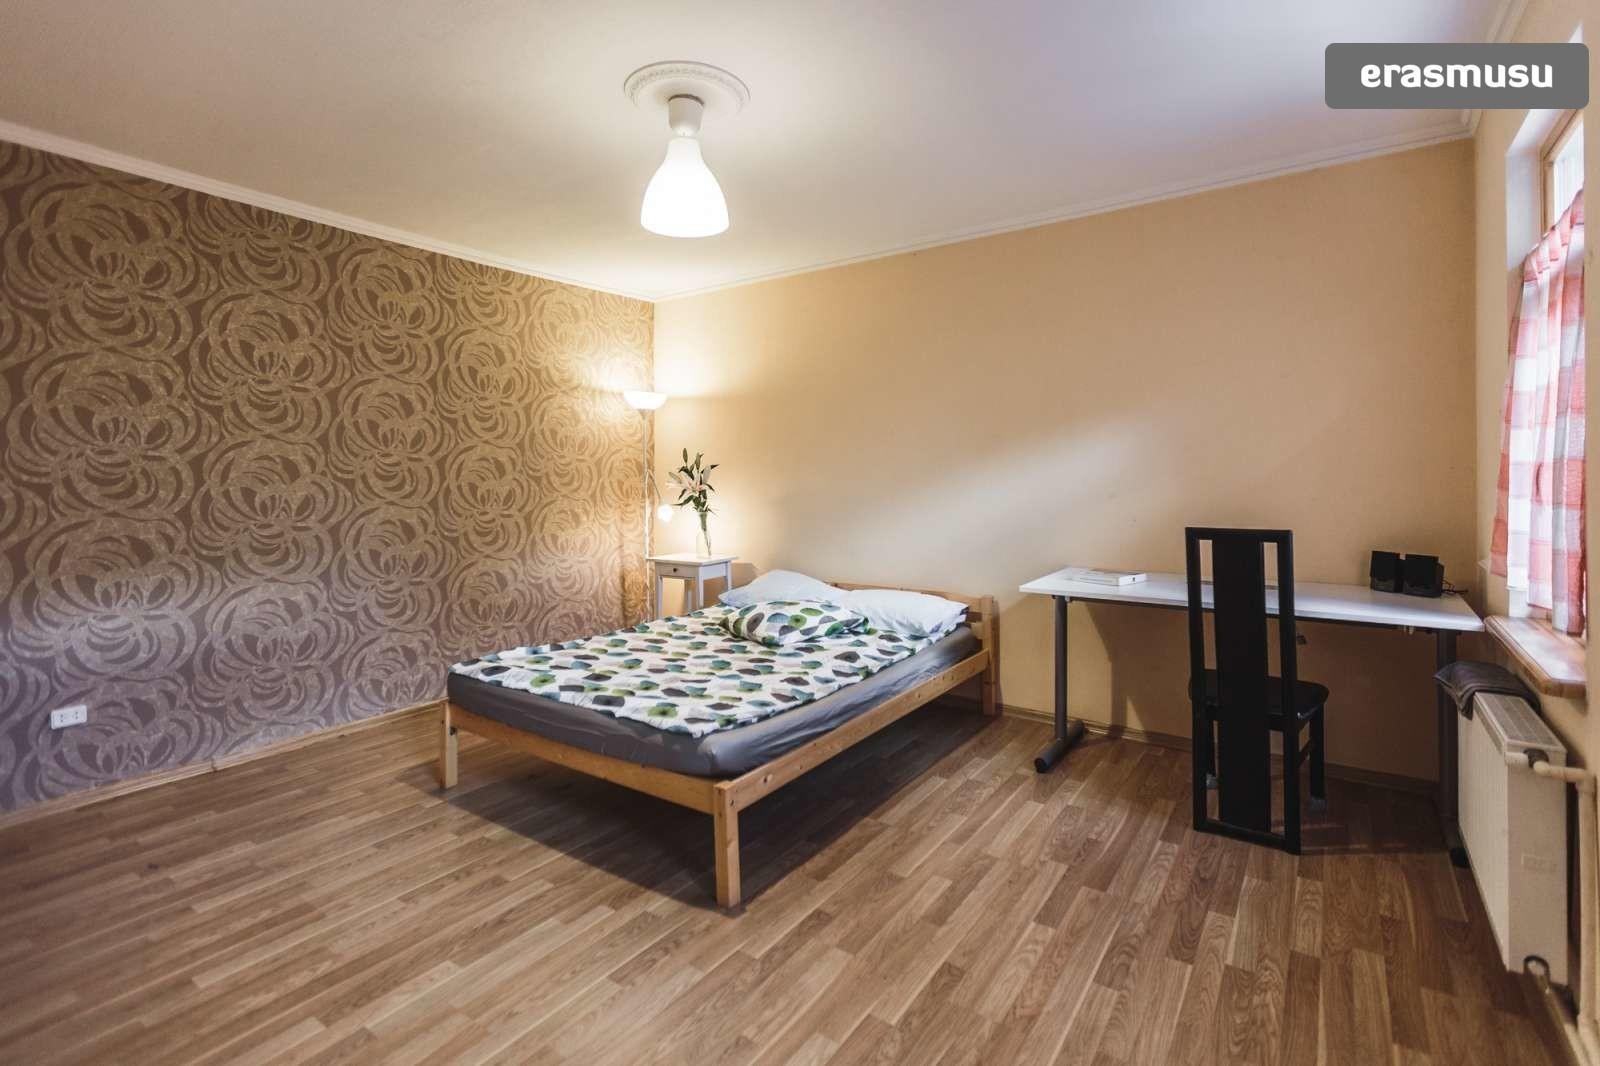 stylish-studio-apartment-rent-avoti-5ba1eed576035ead713a5e55269c